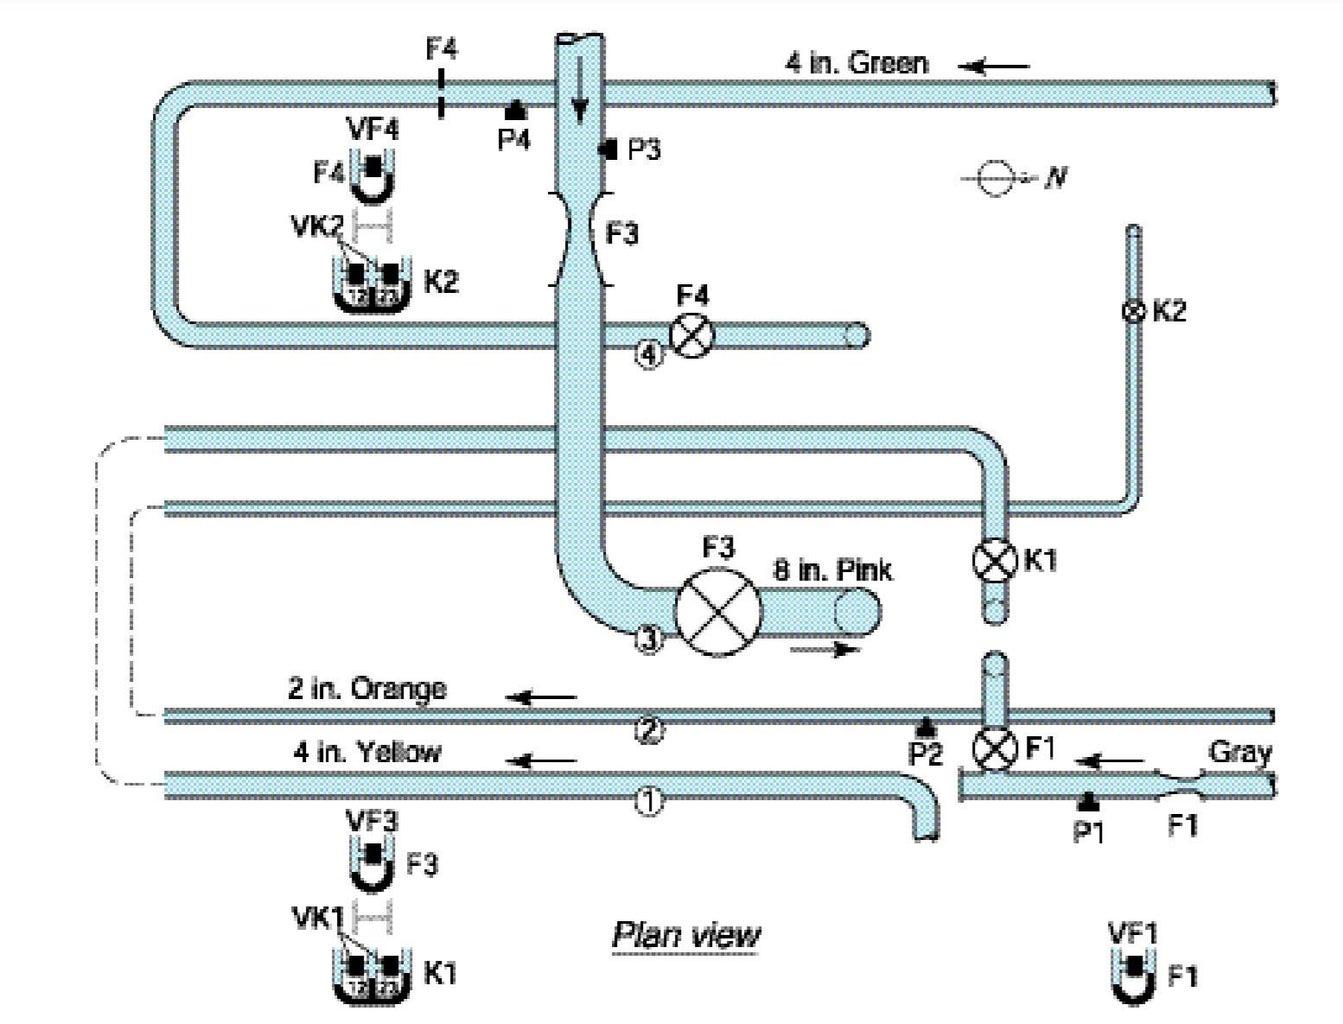 Lab 5: Calibration of a Flowmeter